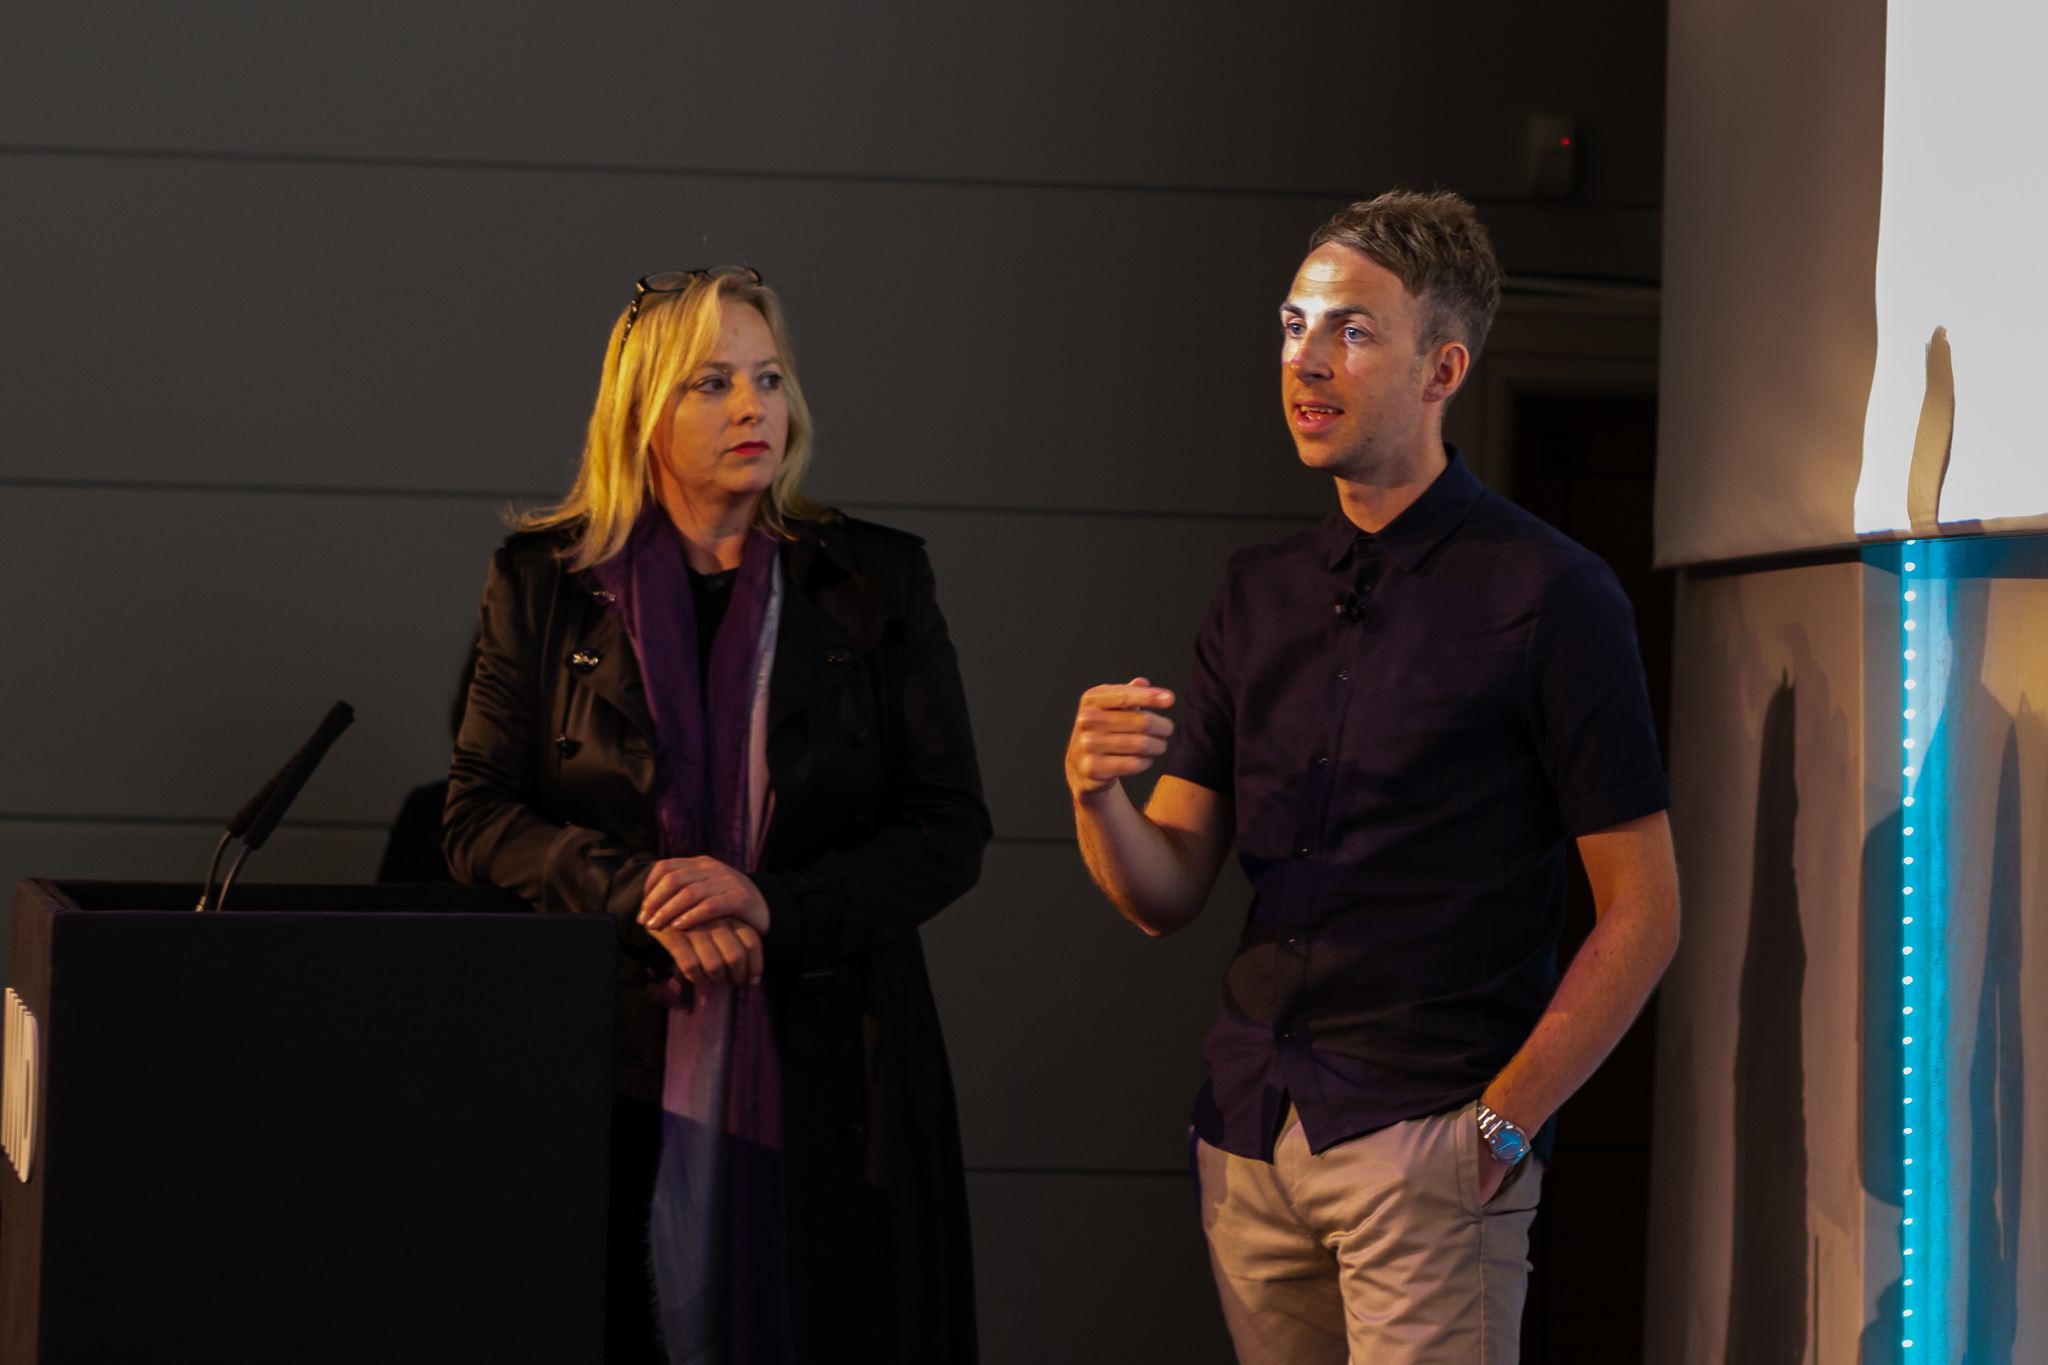 Caroline Crosswell and Darren Read